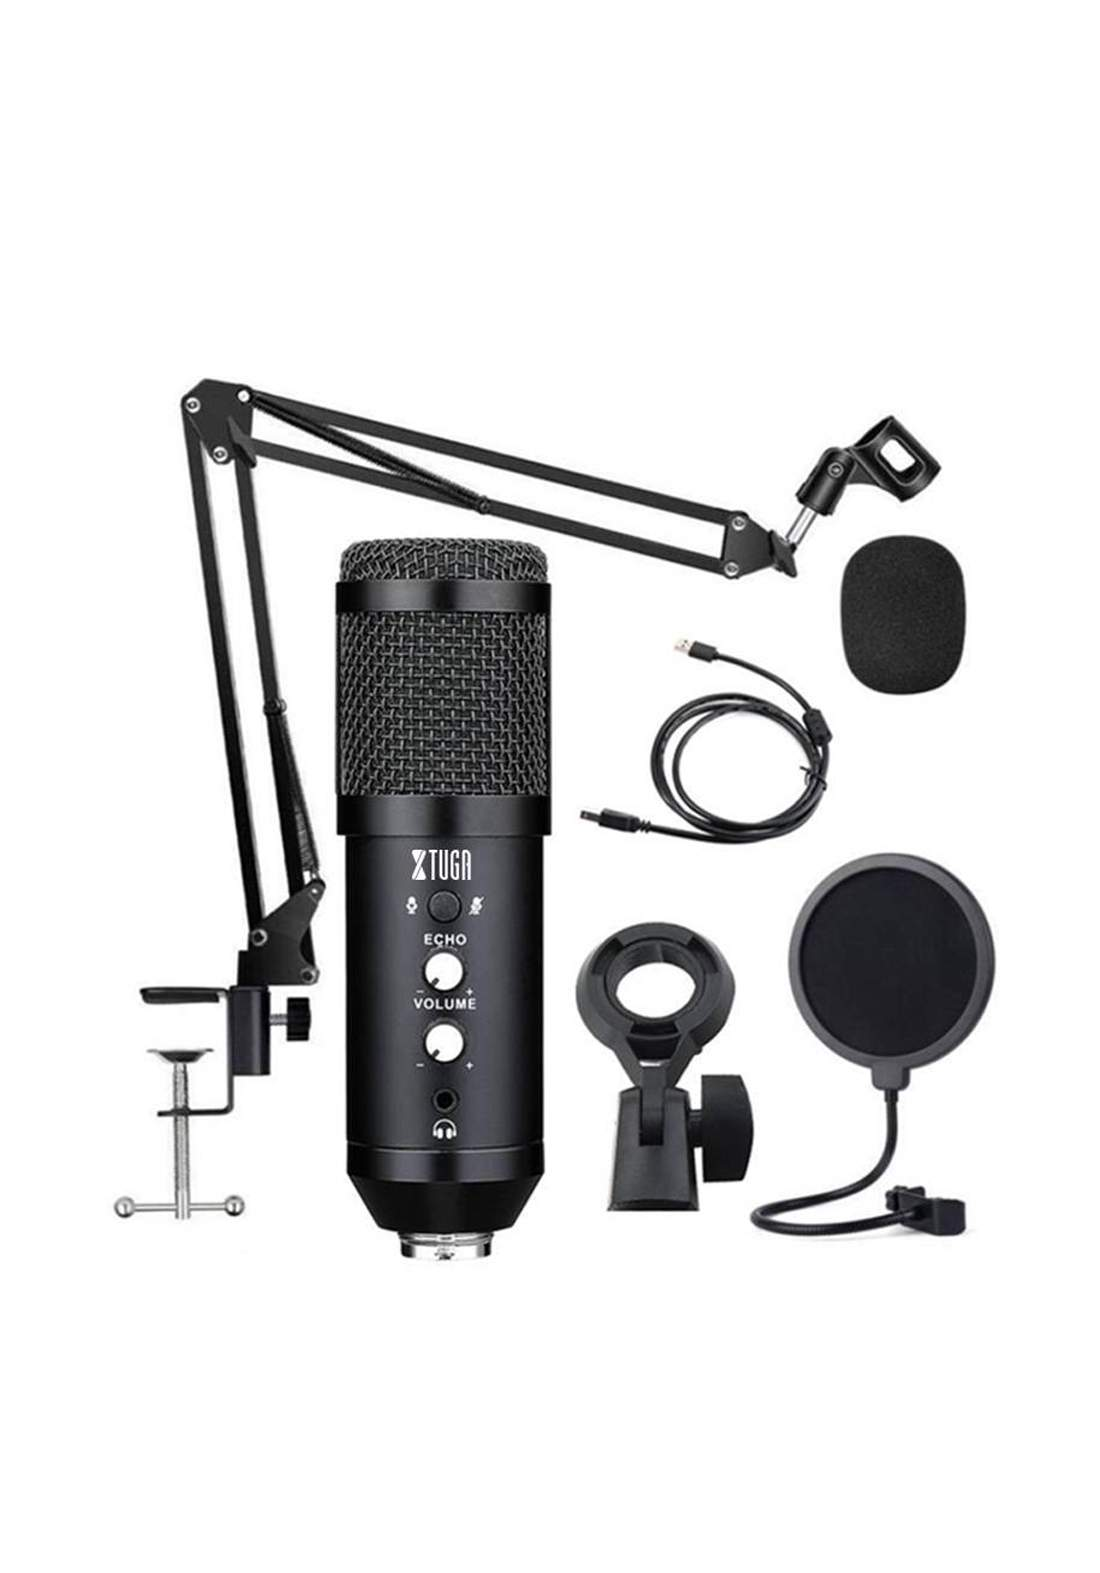 Xtuga BM930 Usb Condenser Microphone  - Black مايكروفون